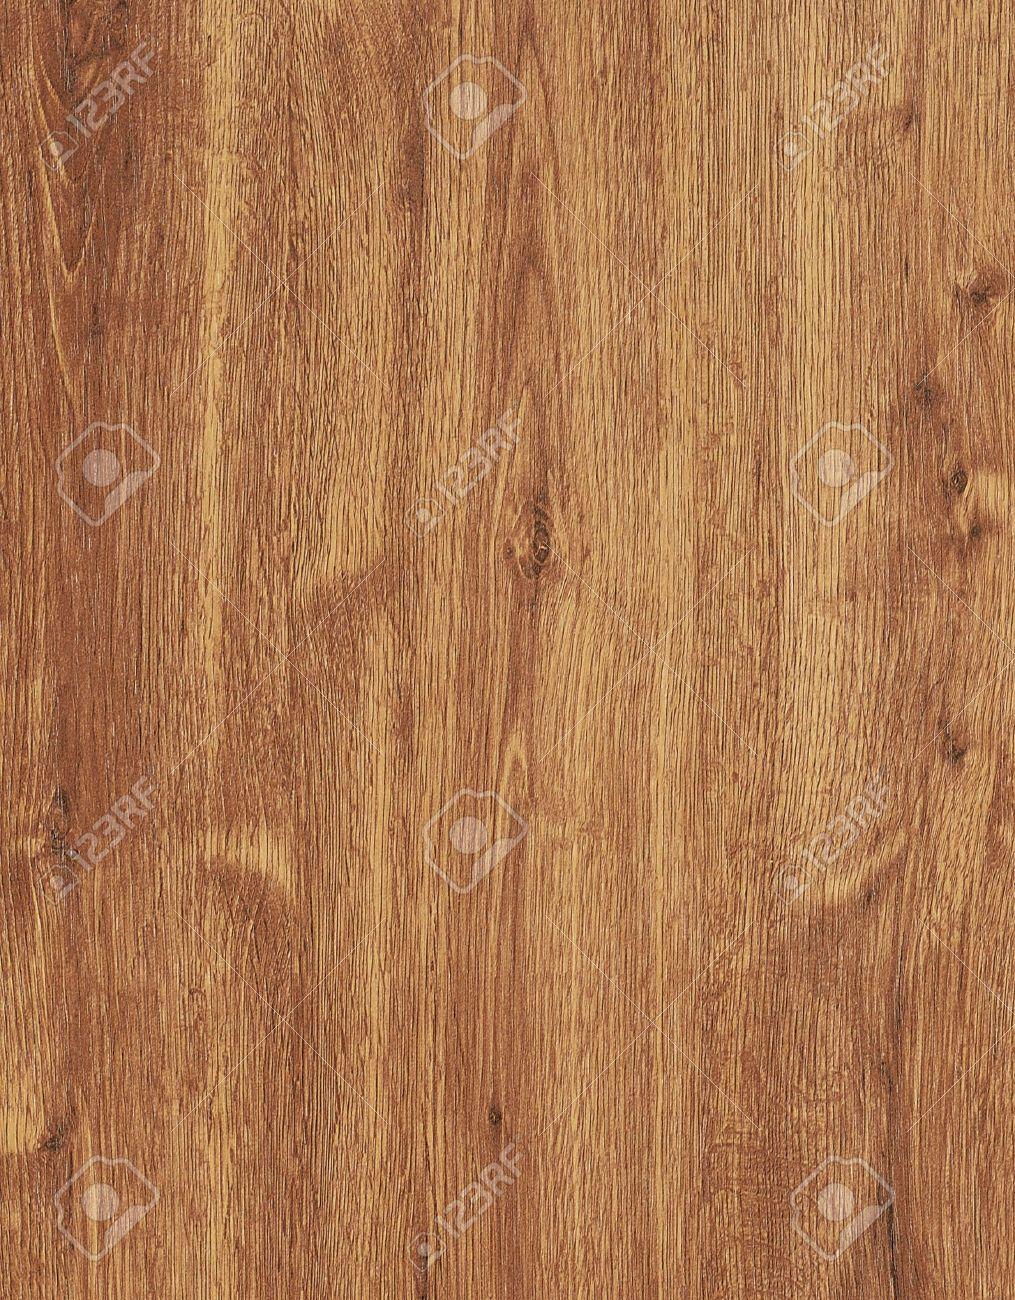 oak wood texture Stock Photo - 5531802